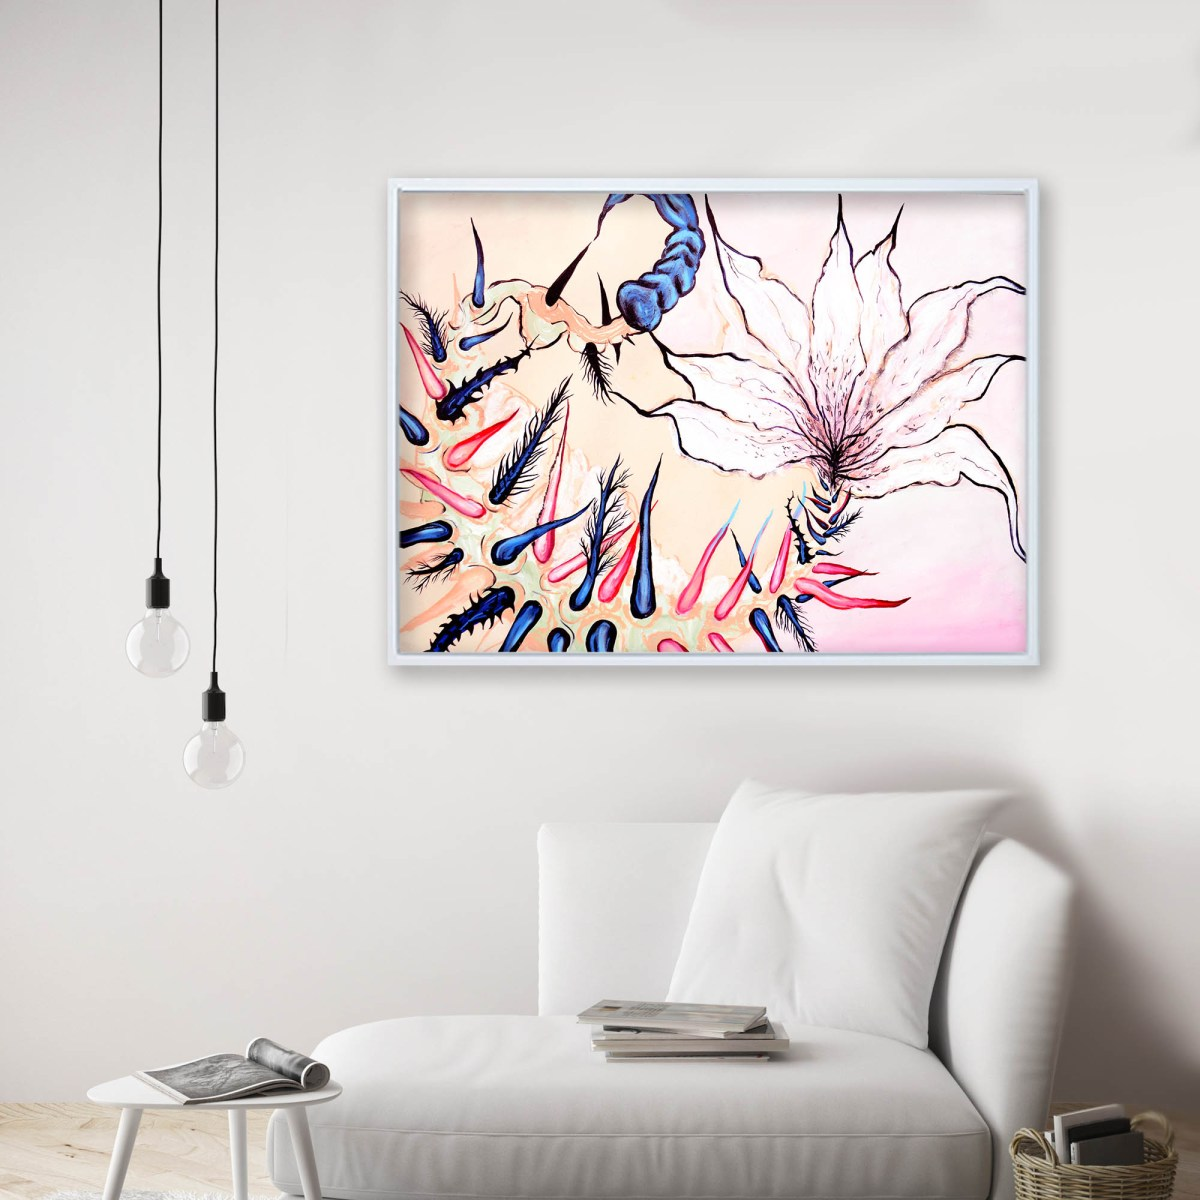 Pintura, Obra Veneno de Alan Hernández en living